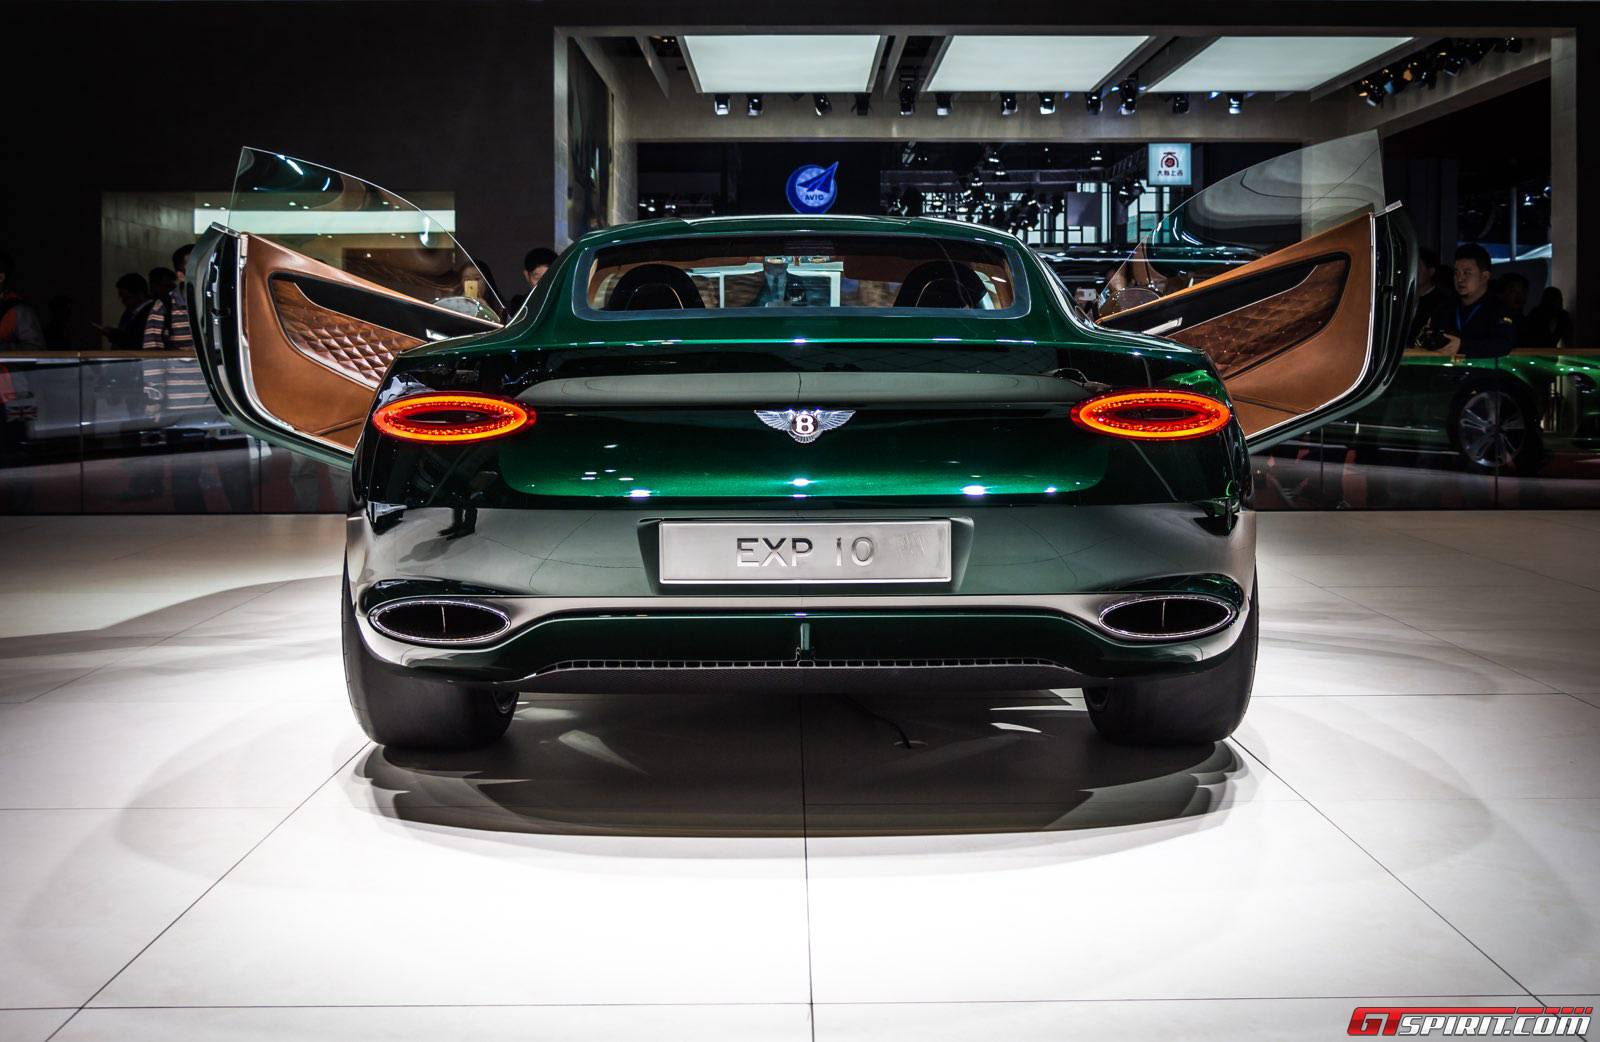 2019 Bentley Barnato Sportscar Confirmed Based On Exp 10